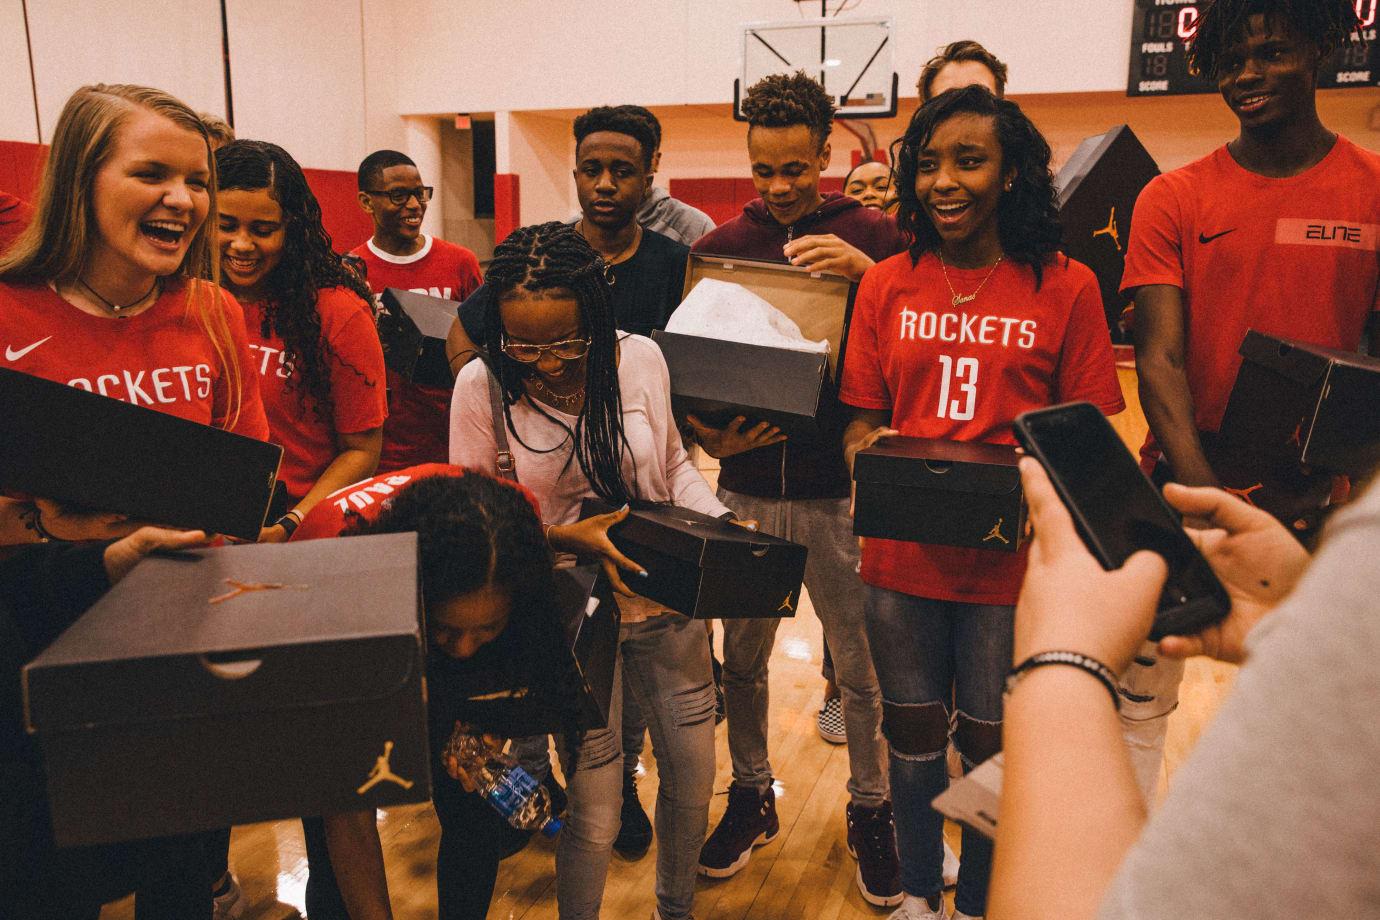 Patricia E. Paetow High School Students React to Jordan CP3.XI Sneakers